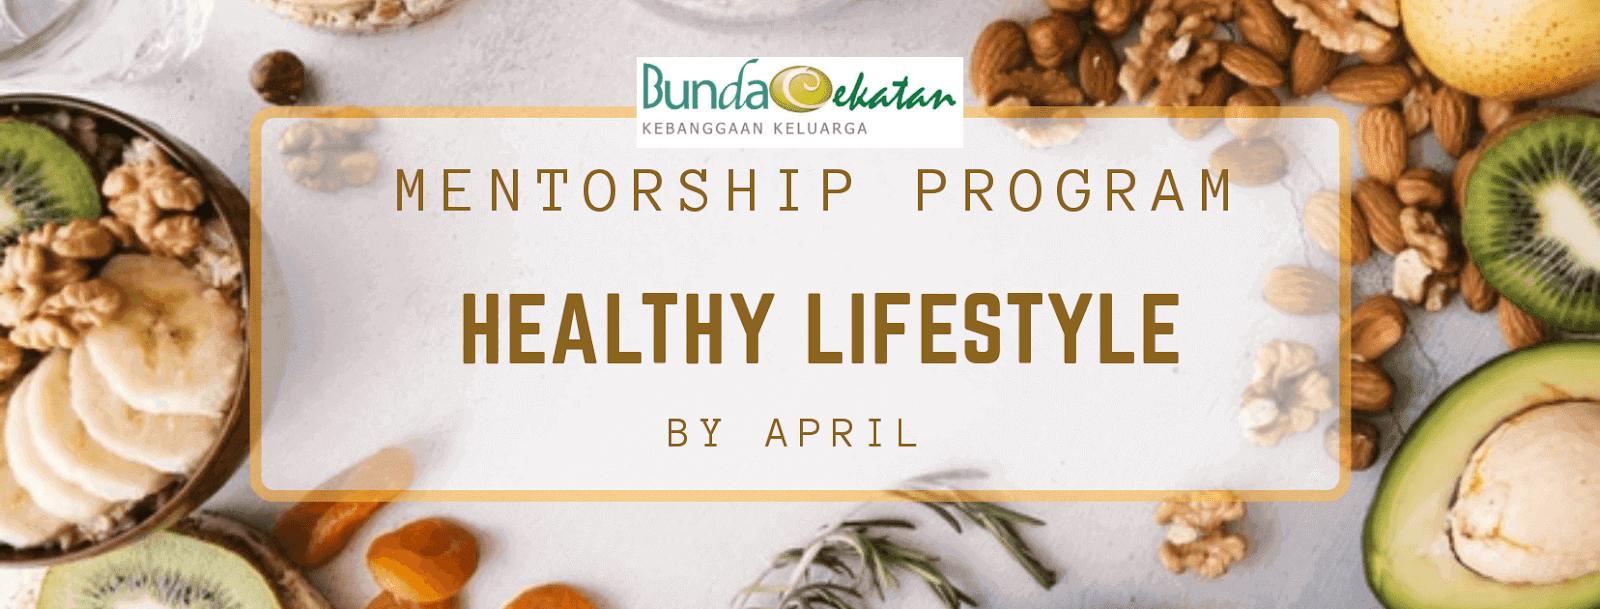 mentorship program healty lifestyle